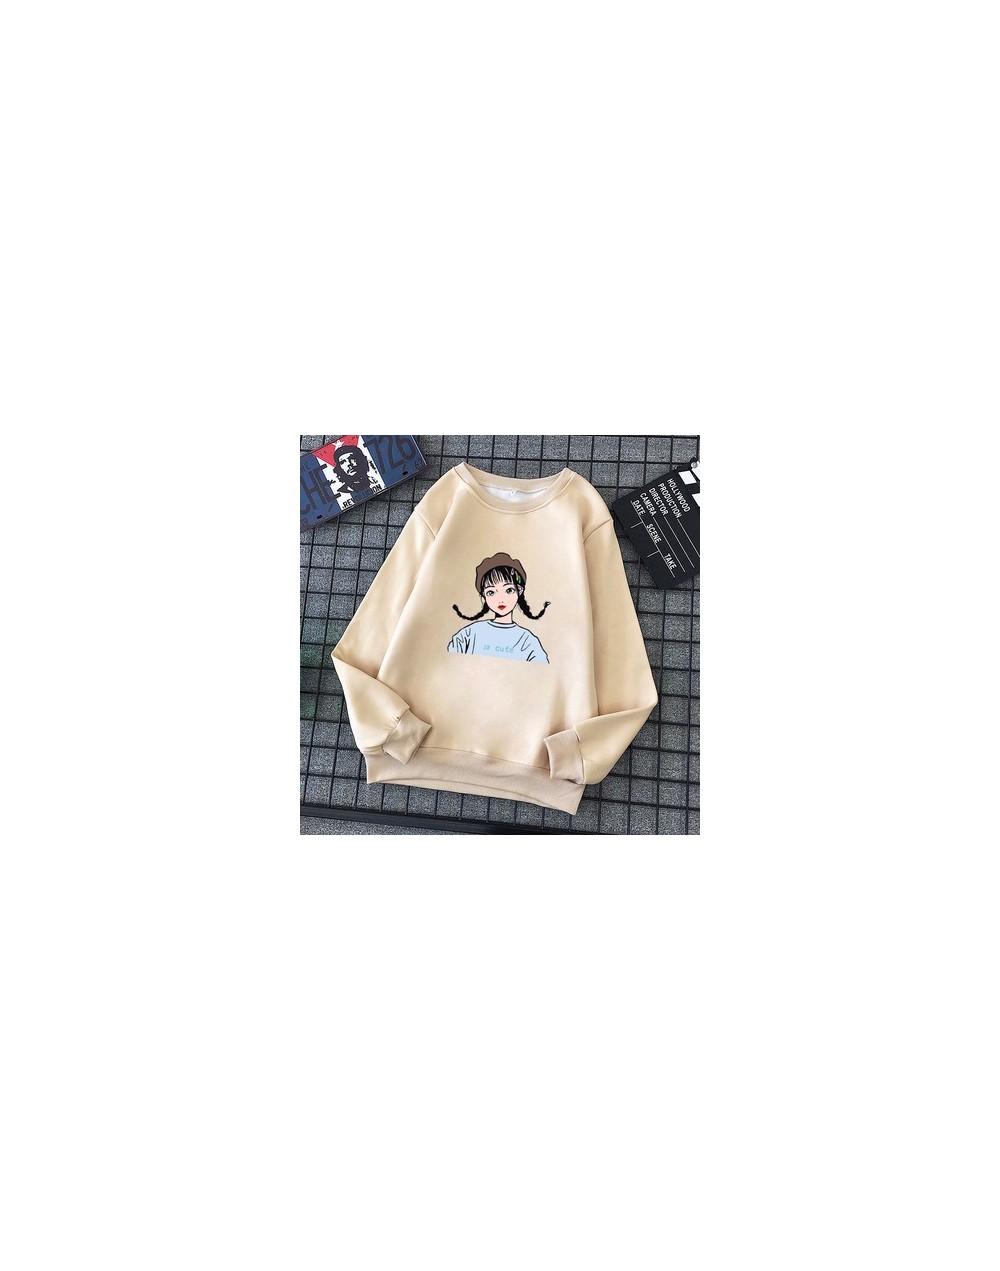 Hoodies Women Large Size All-match Plus Velvet Cartoon Printed Long Sleeve Womens Sweatshirts O-neck Leisure Ladies Pullover...